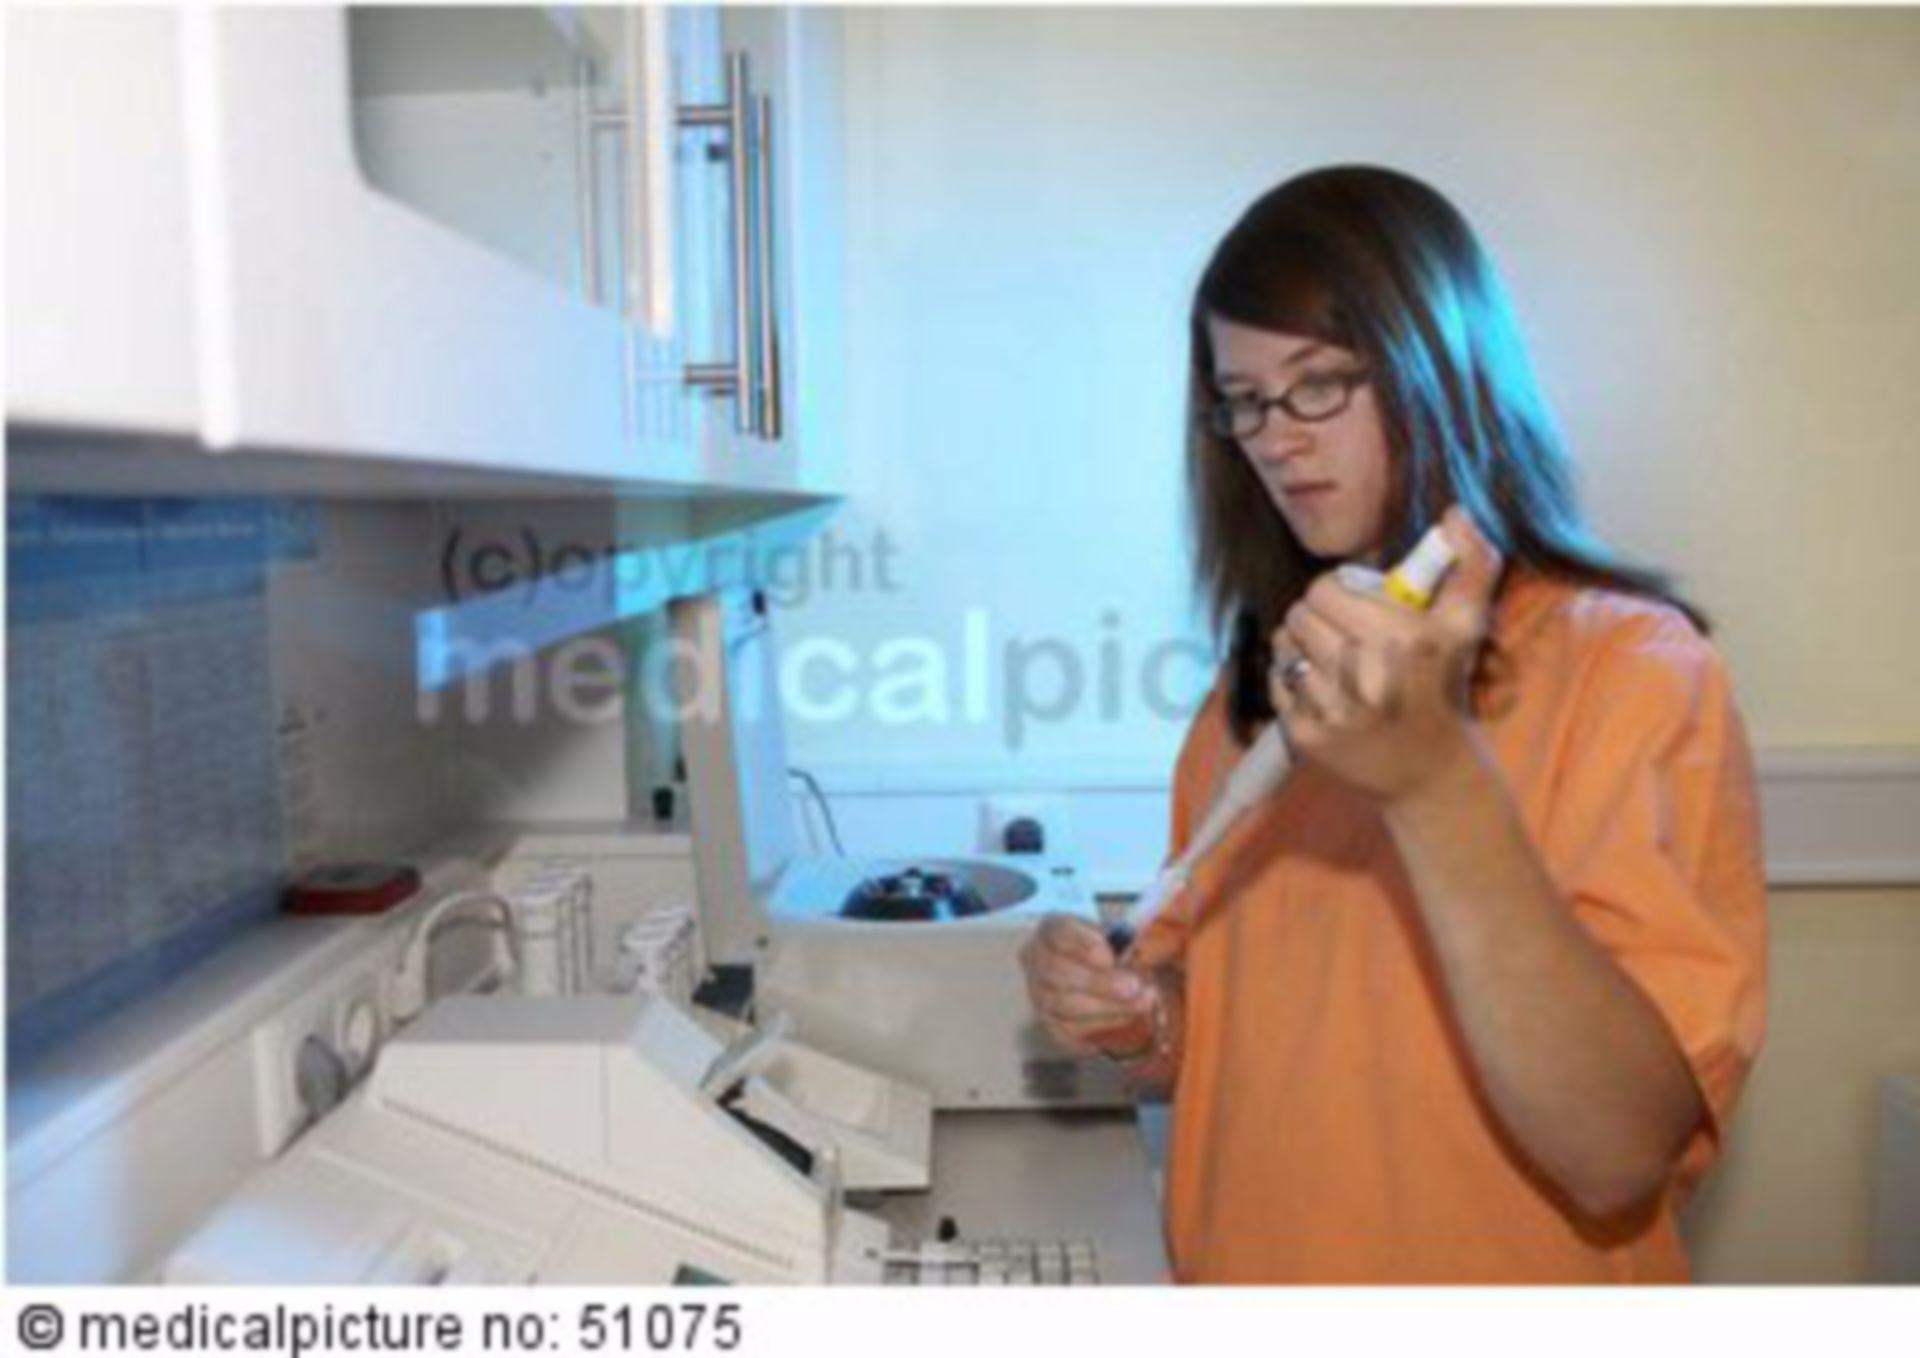 Laborassistentin mit Pipette und Blut